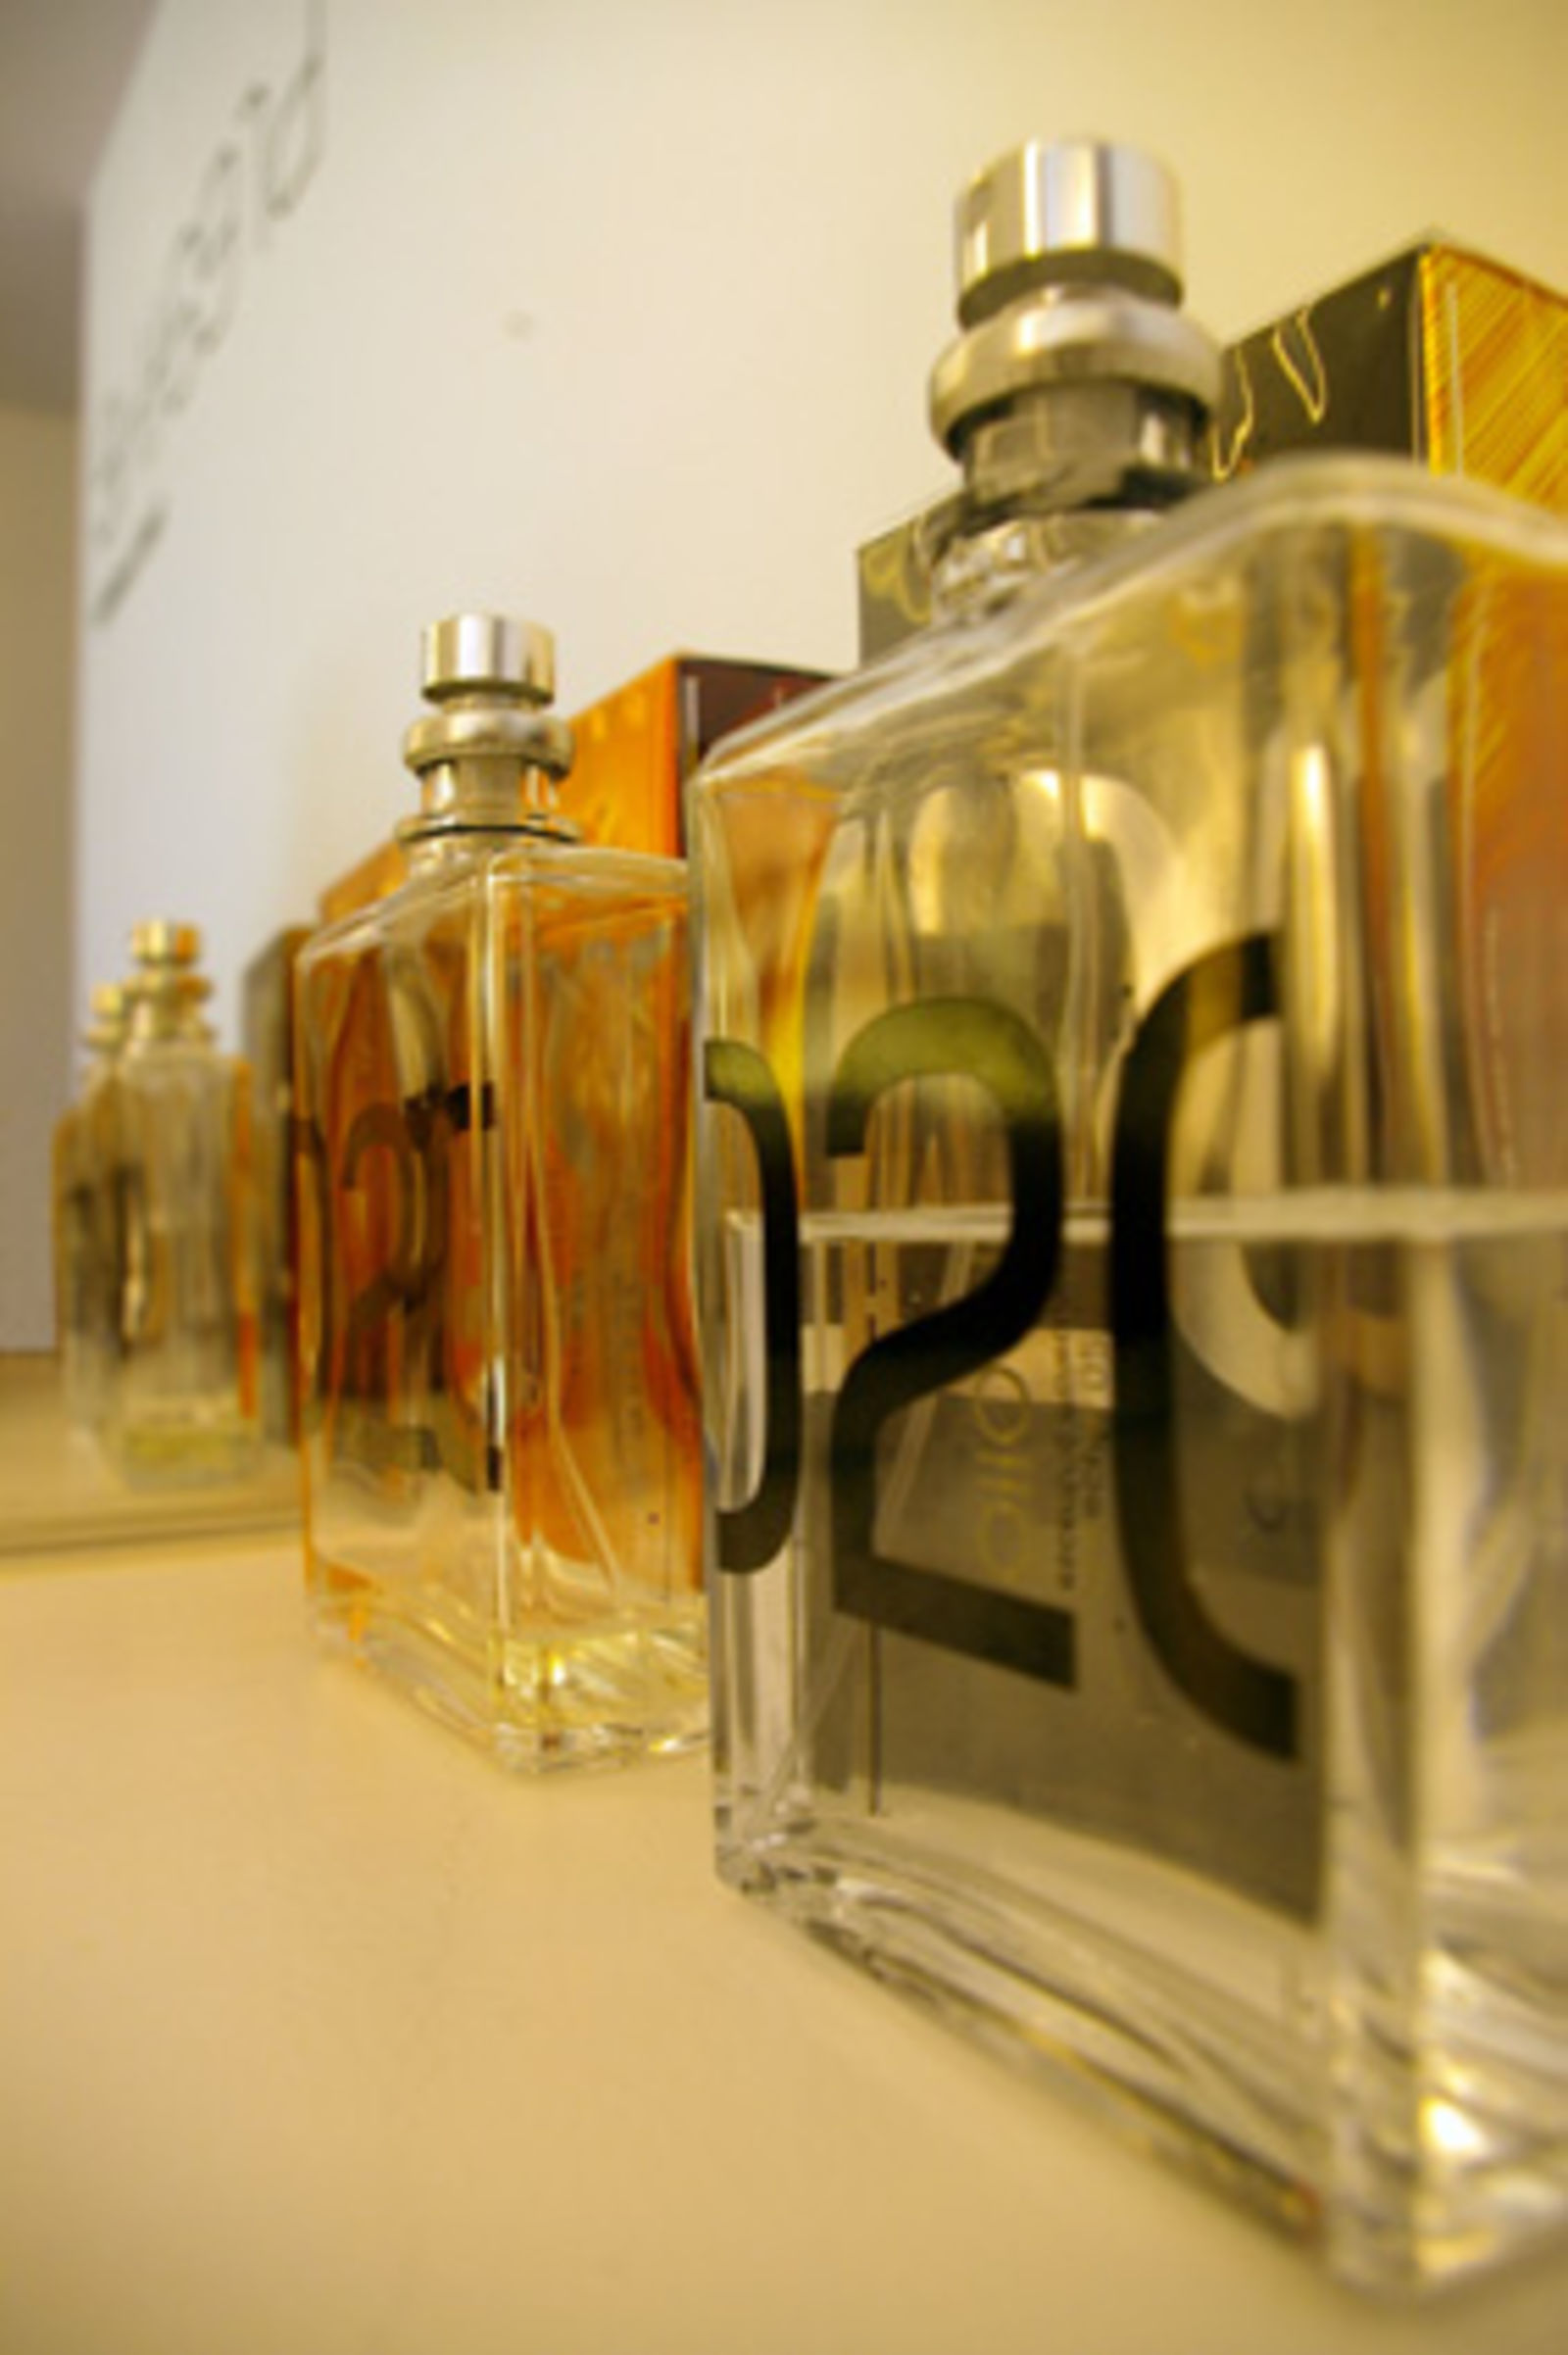 BREATHE fresh cosmetics in Berlin (Bild 17)